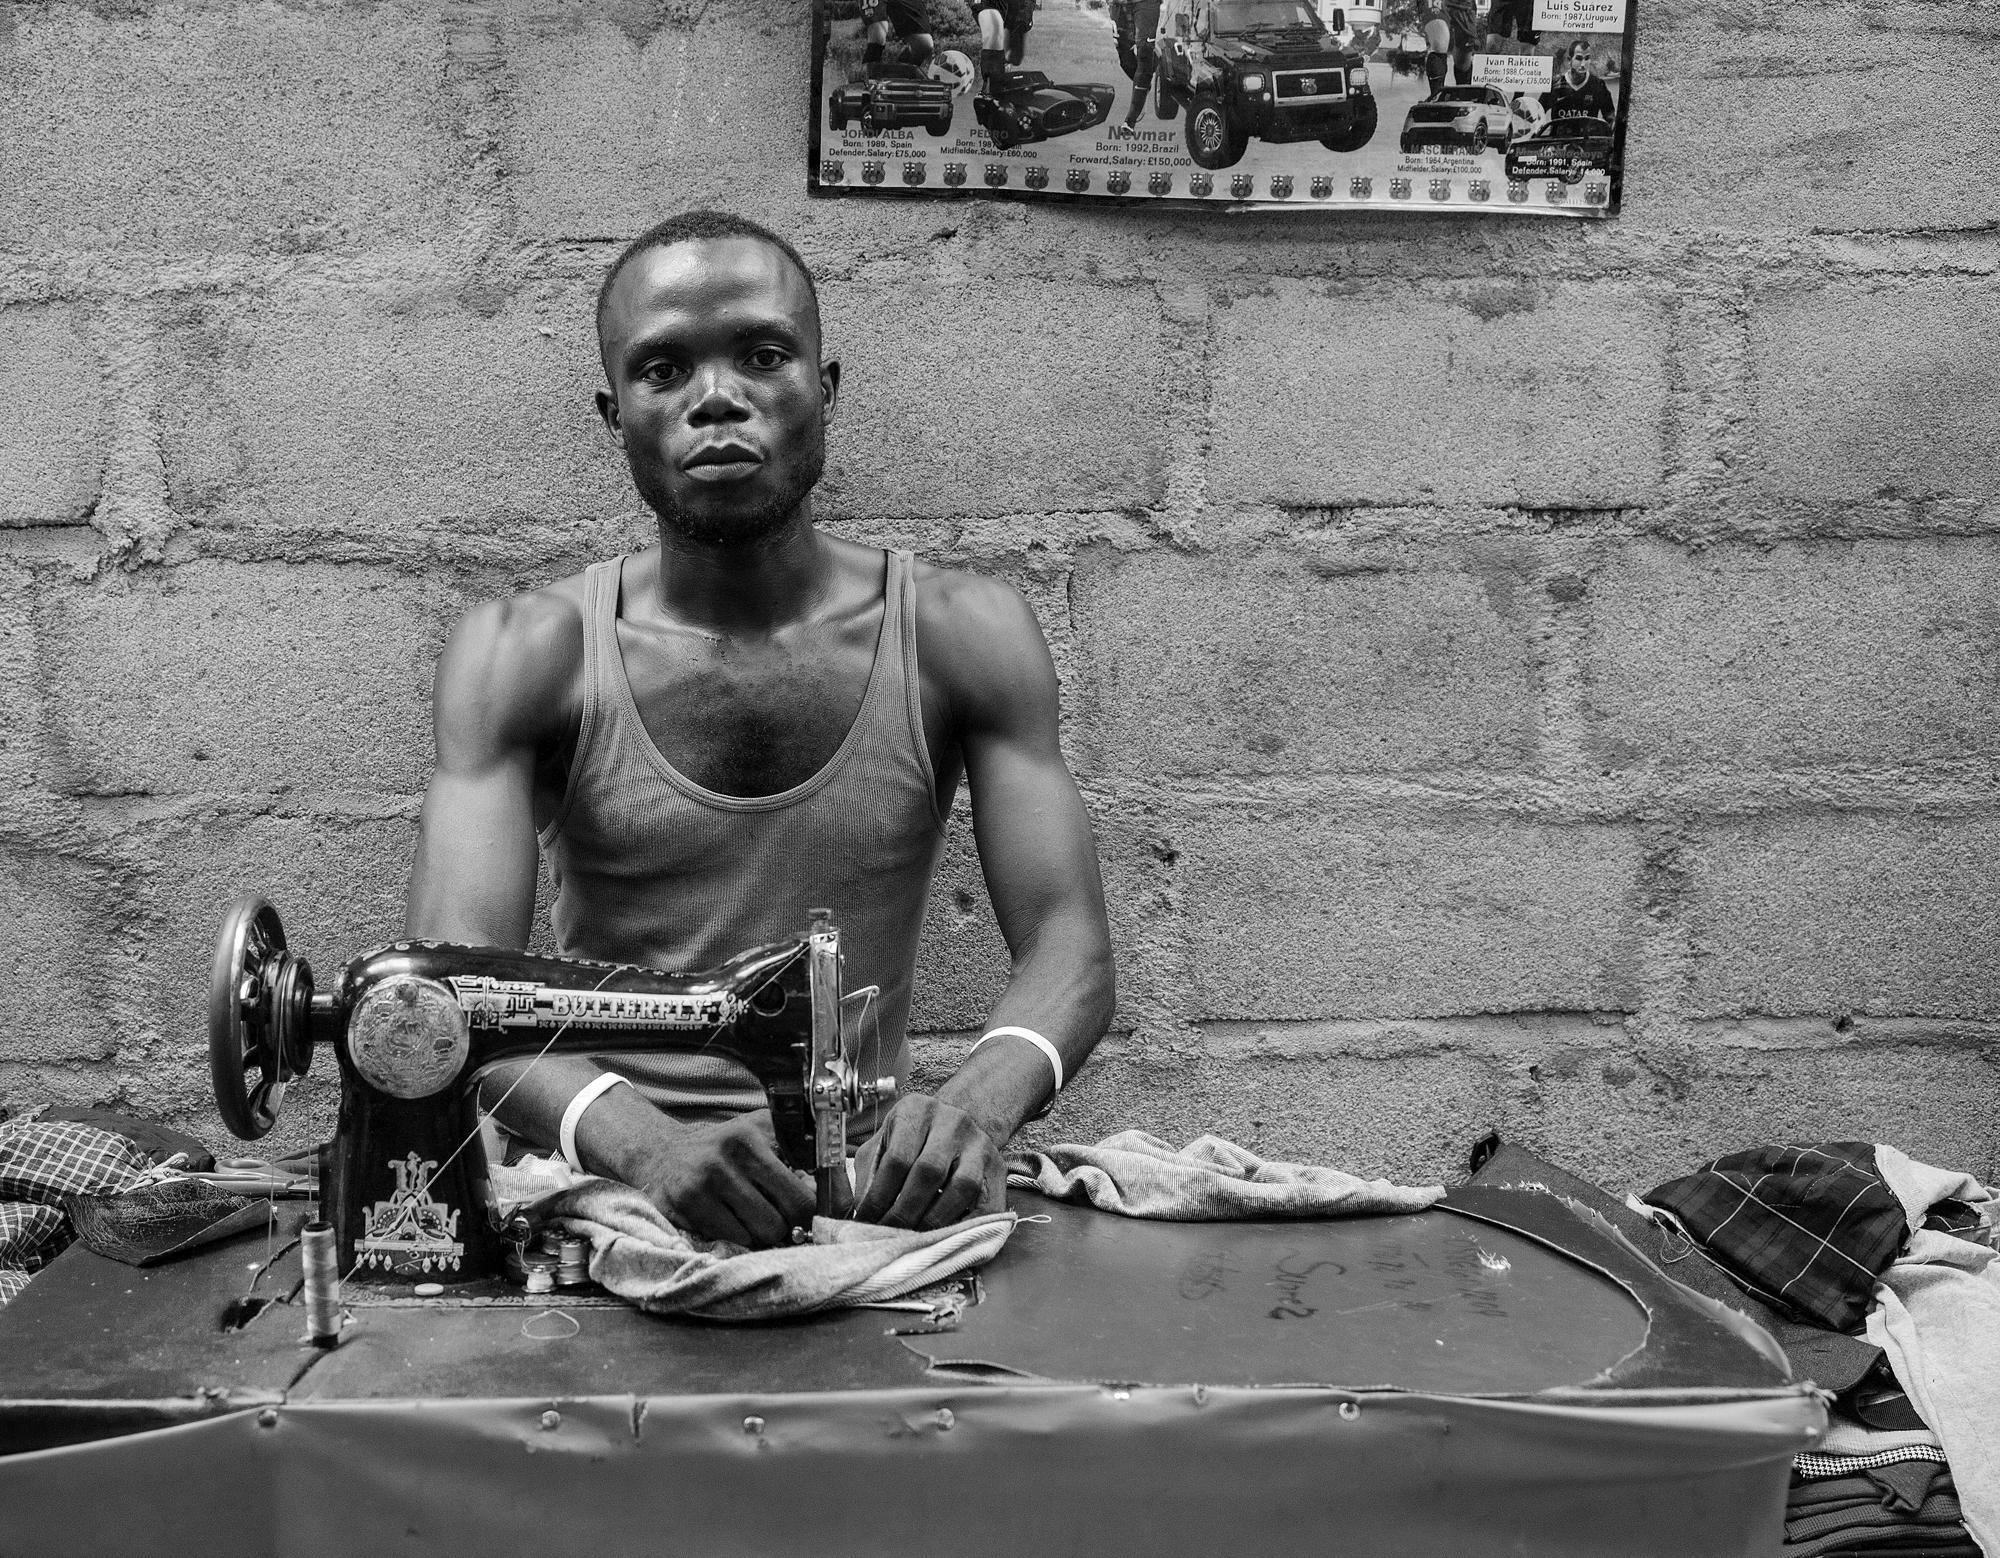 The Sewing Machine Man